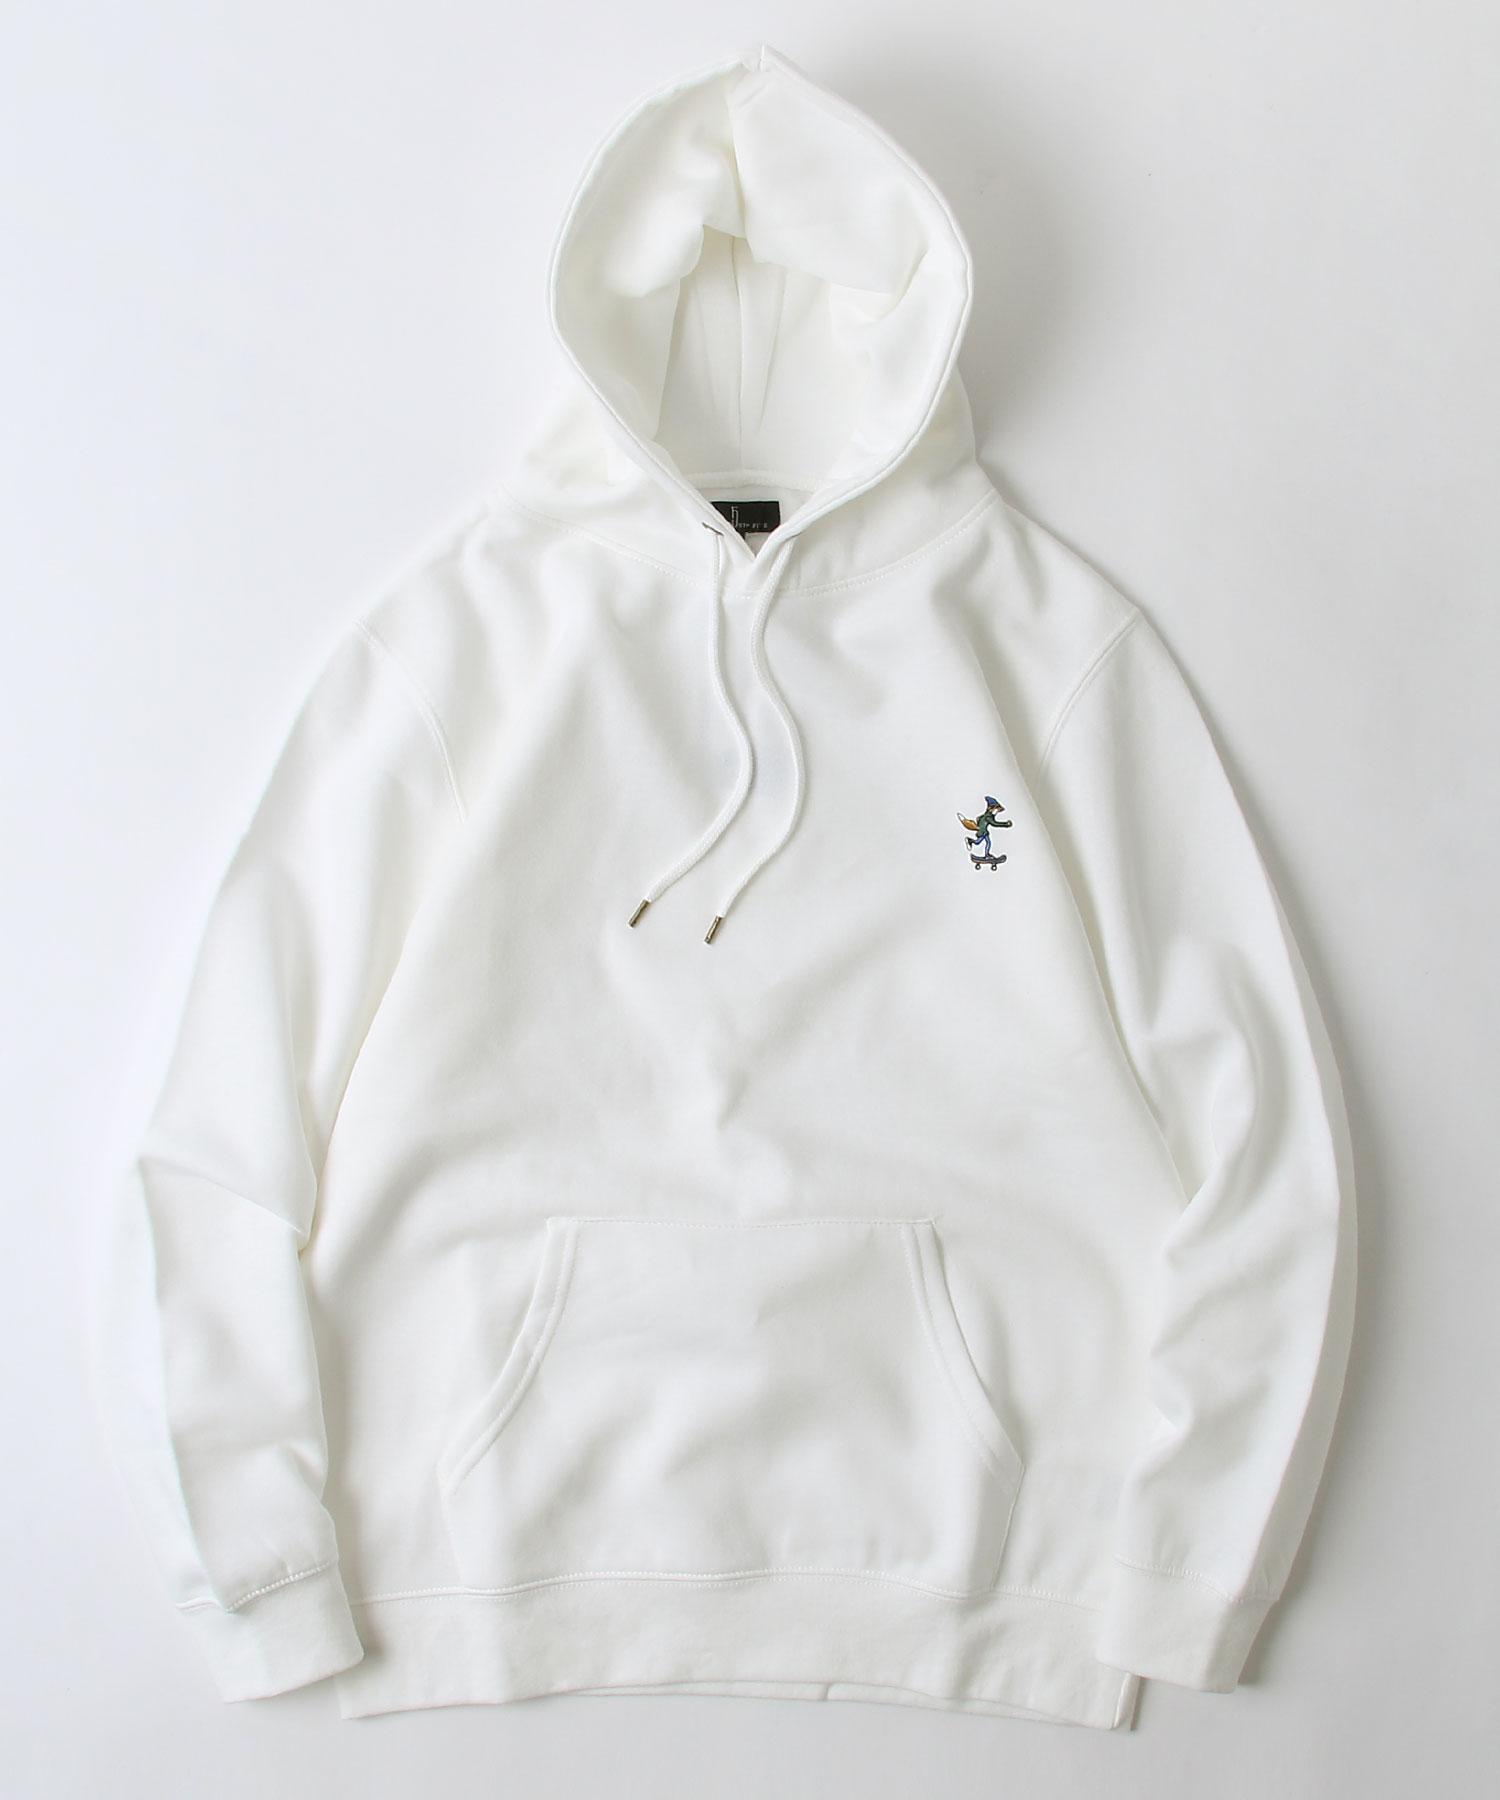 【ZIP】刷毛連帽運動衫【L-XL】 3